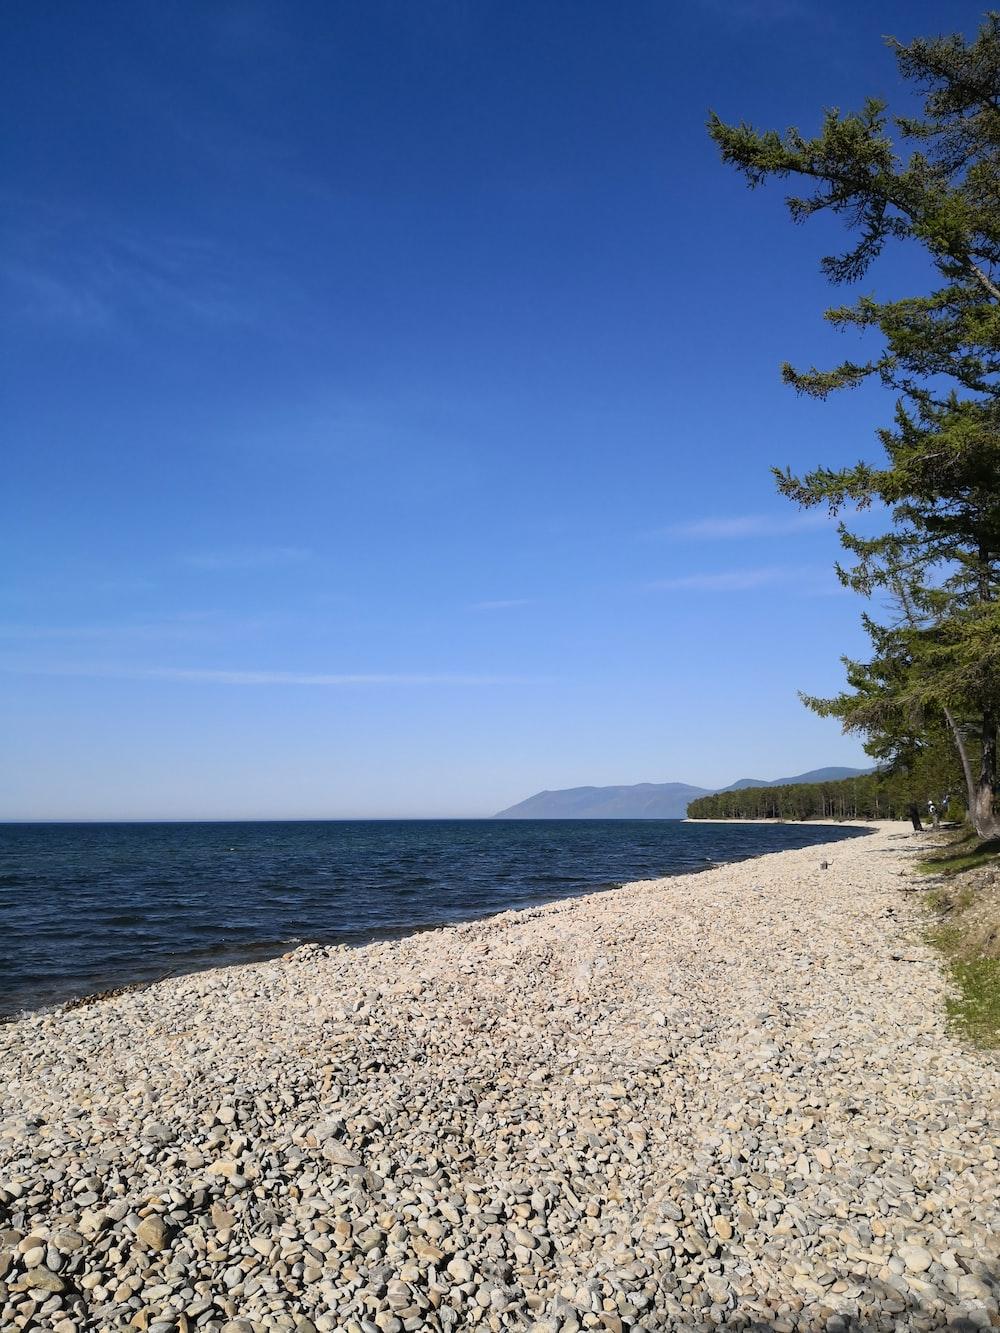 landscape photo of a beach